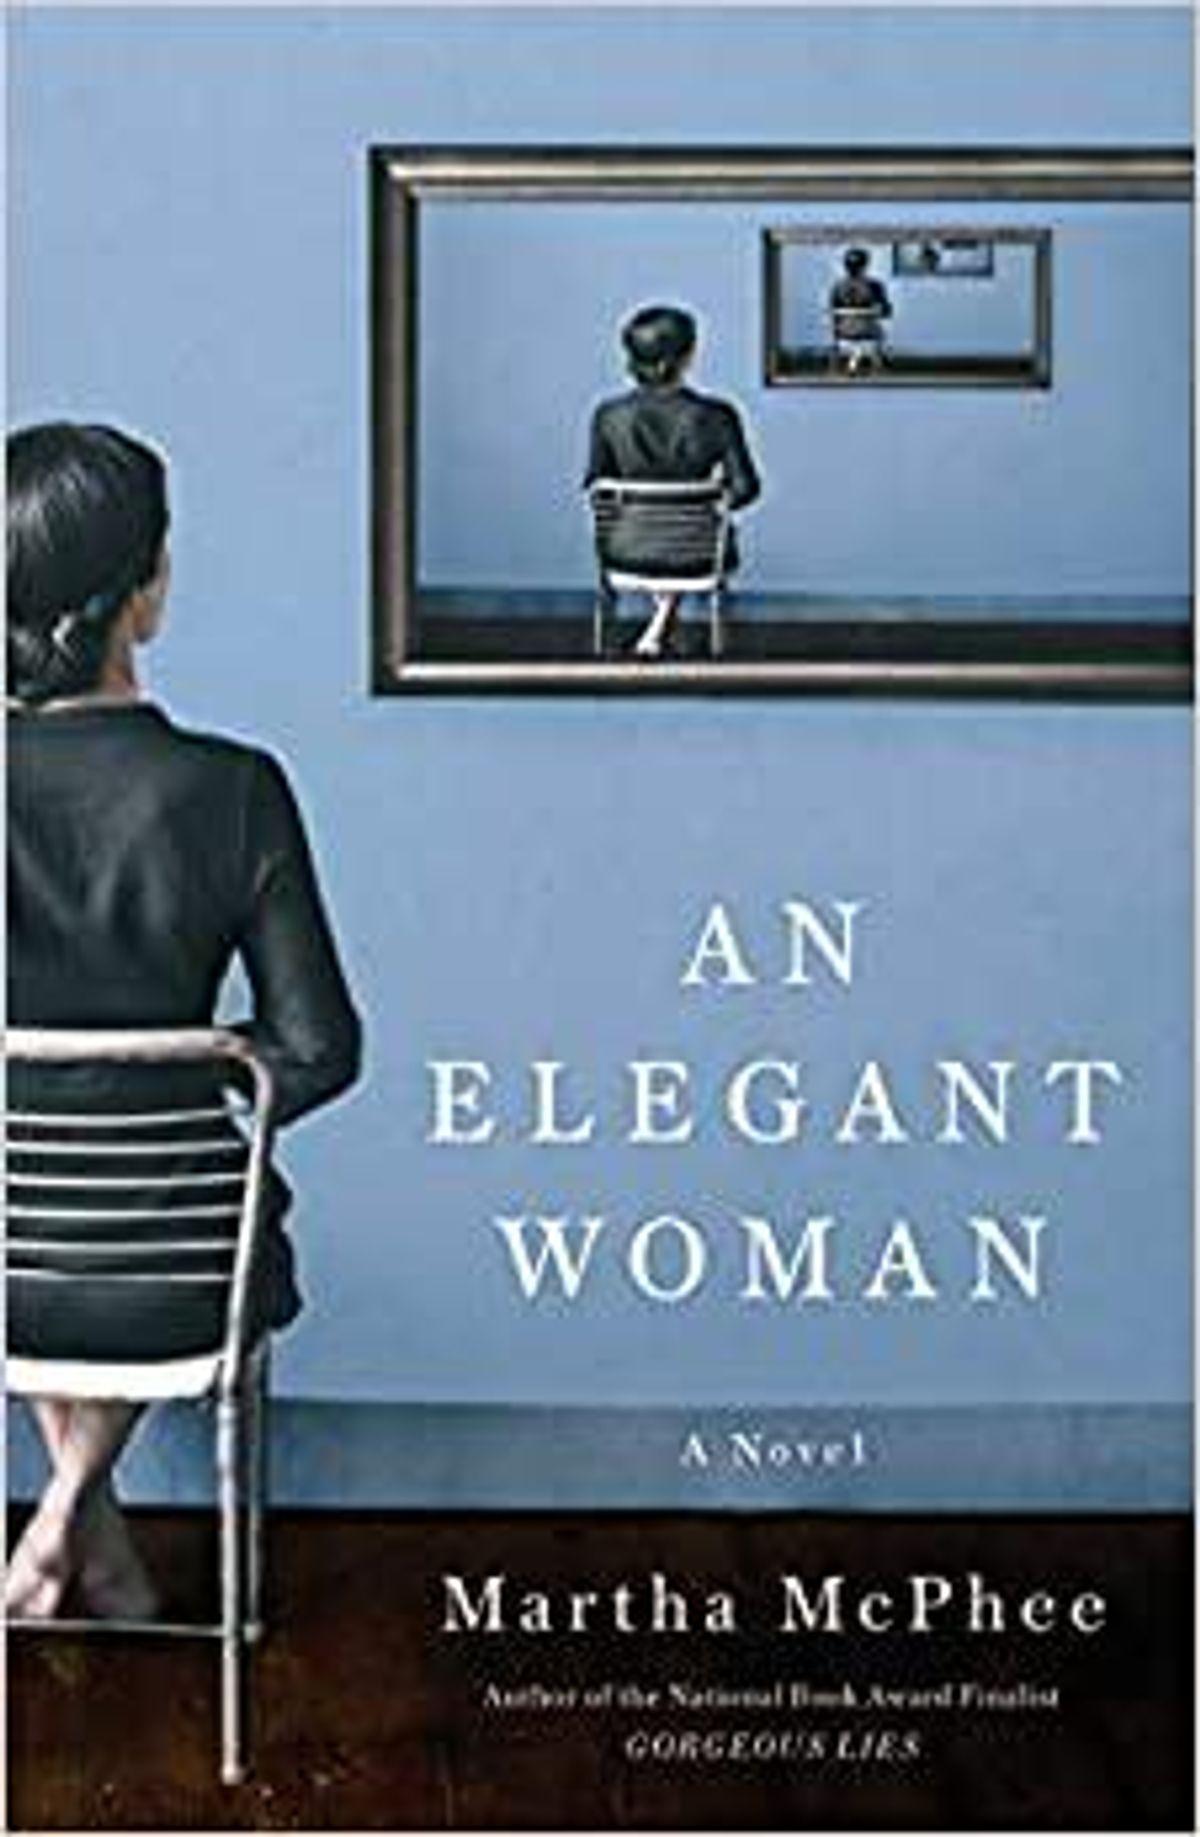 An Elegant Woman by Martha McPhee